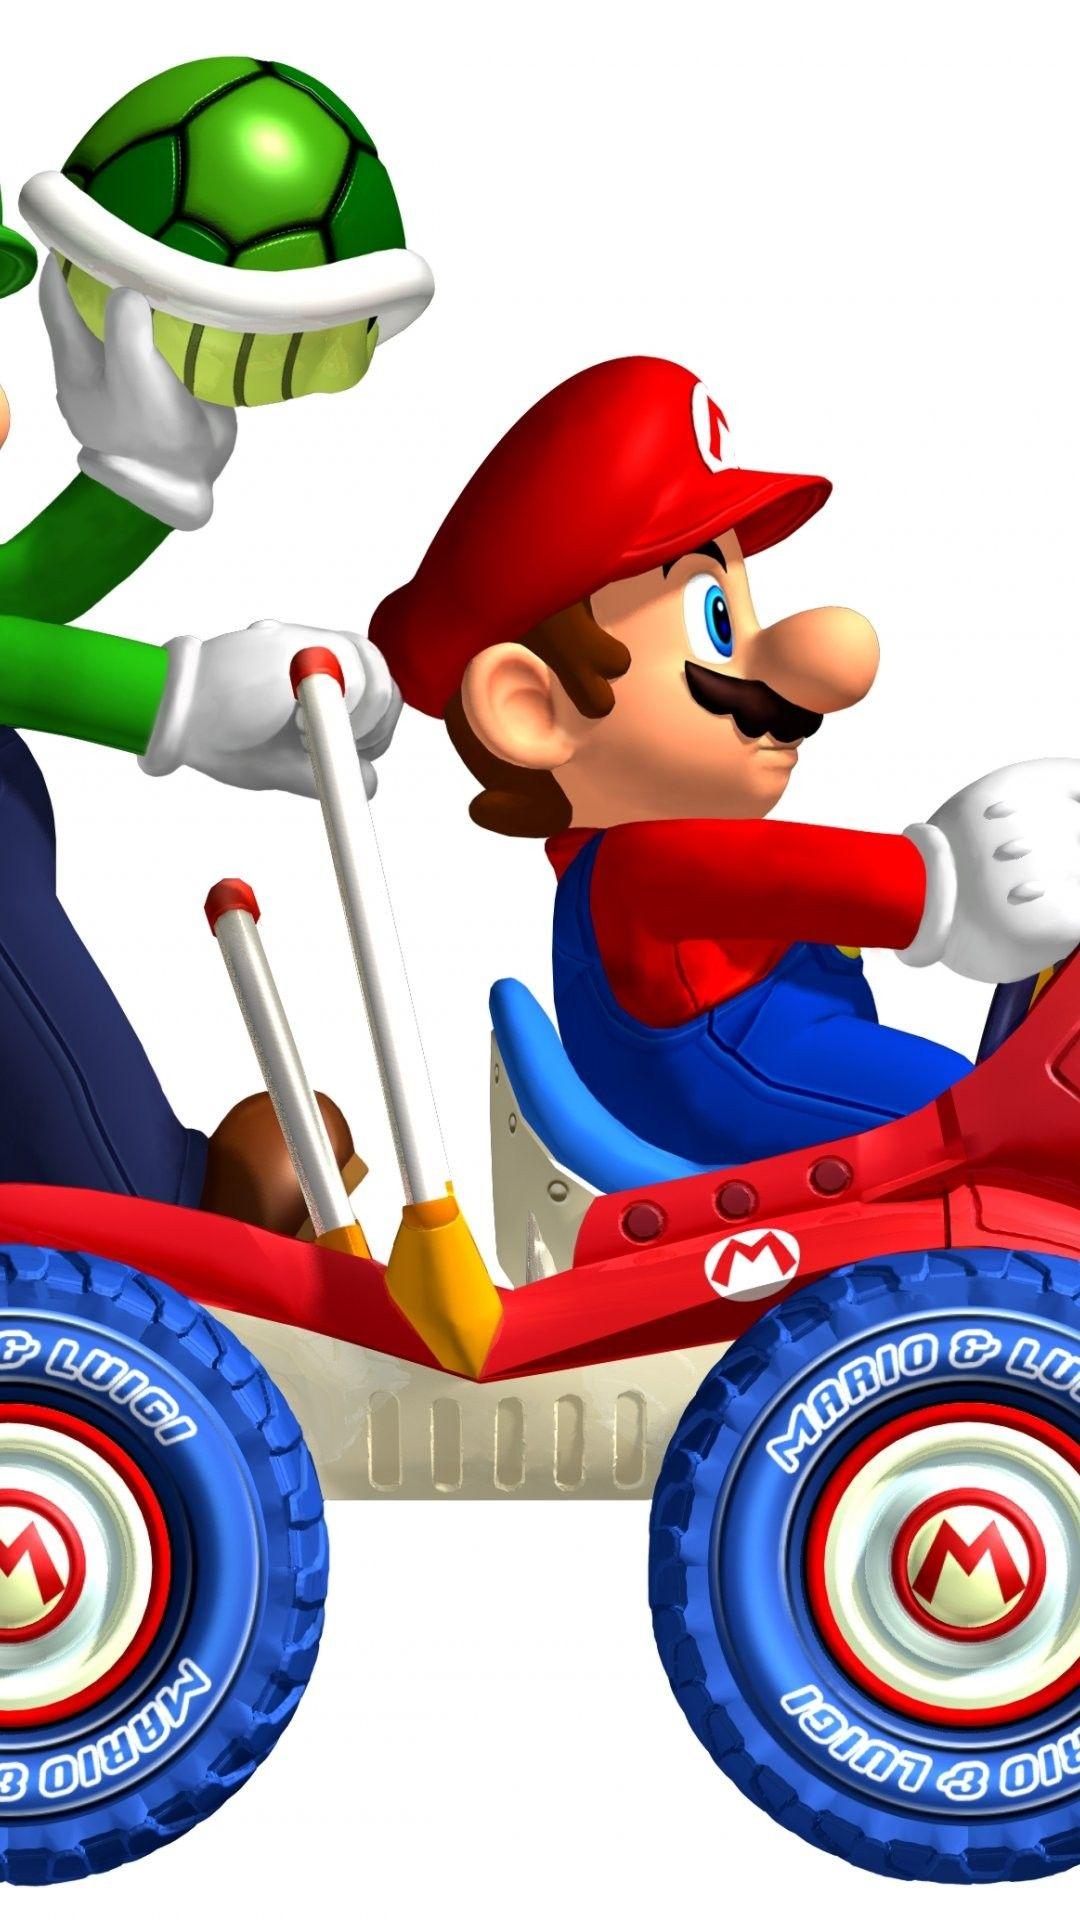 Mario Kart iPhone 6 Plus Wallpaper 11646 Games iPhone 6